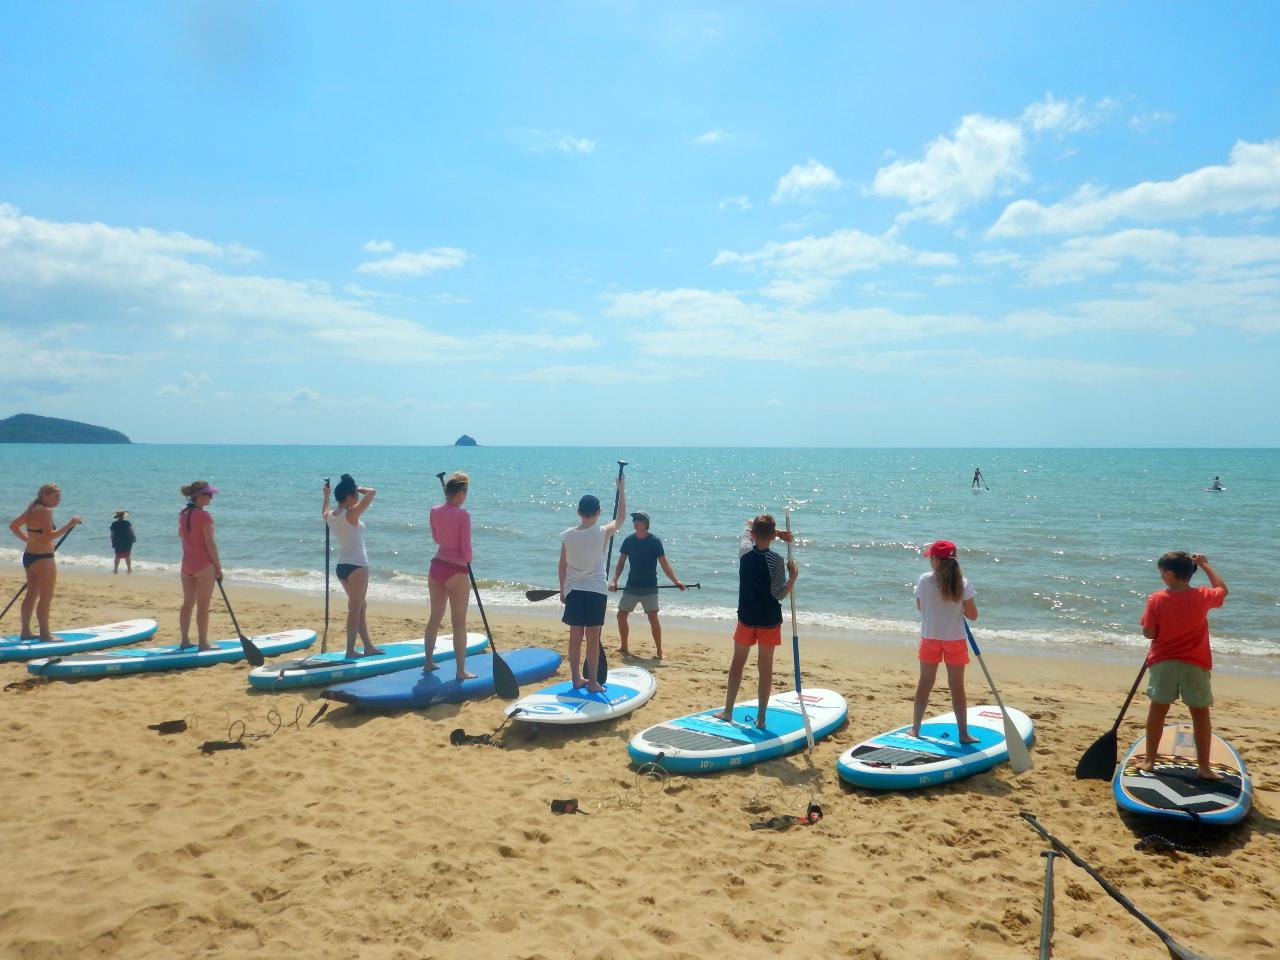 Sunrise Paddle Boarding - Group Lesson